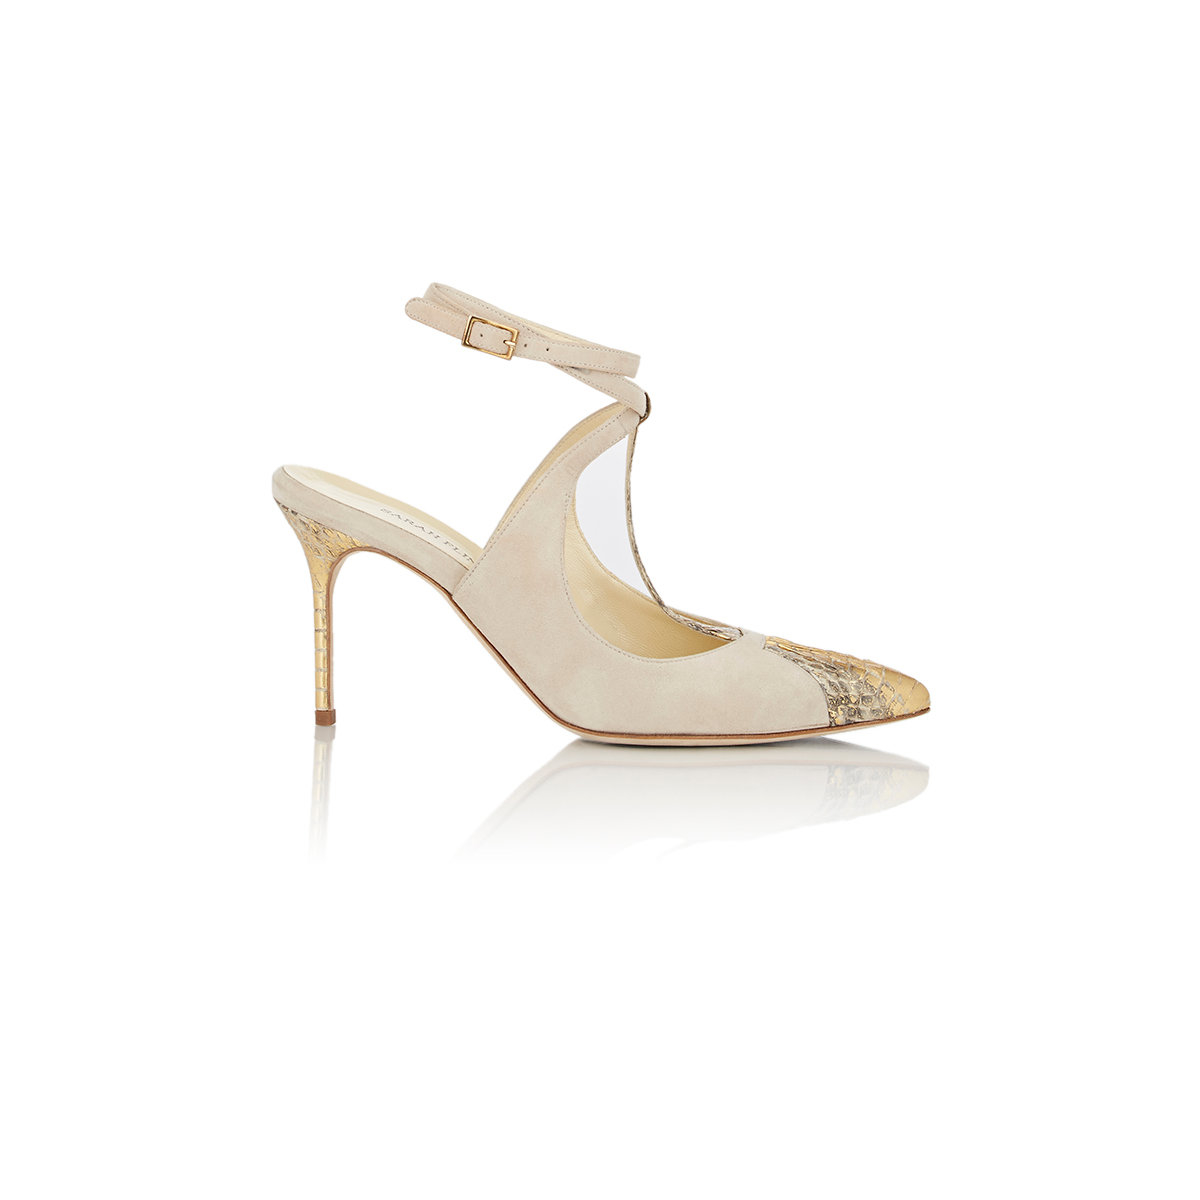 9160190eb41 sarah-flint-nude-suede-snakeskin-nancy-t-strap-sandals-beige-product-0-946346709-normal.jpeg